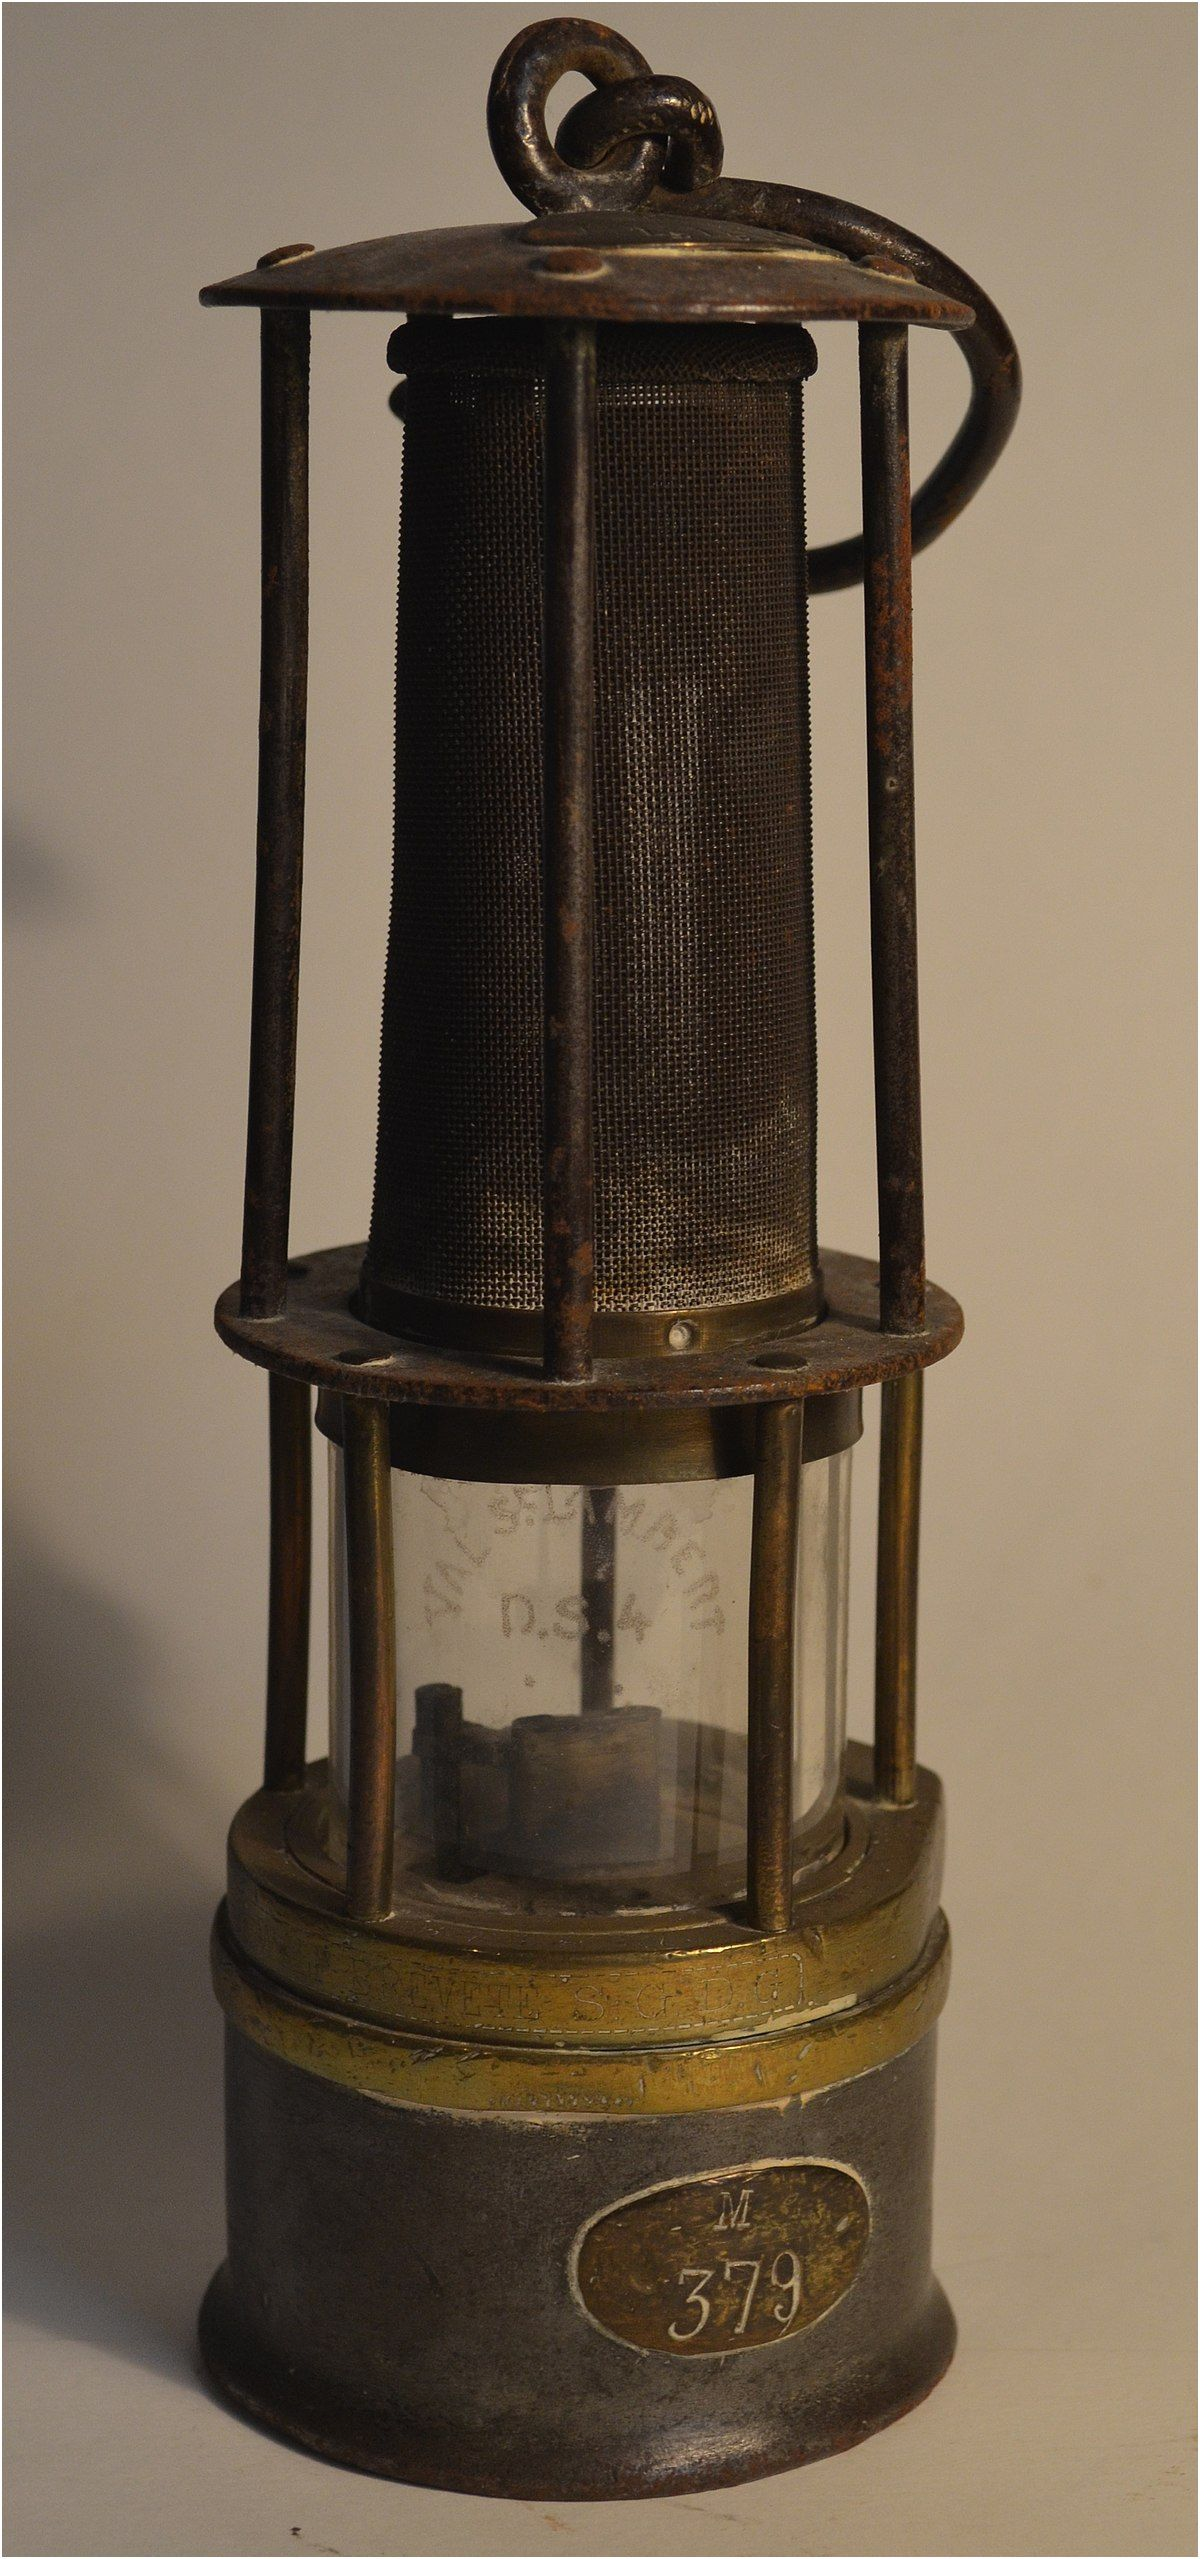 15 Lunatique Lampes Anciennes Gallery Lampe Ancienne Lampe A Petrole Ancienne Lamp